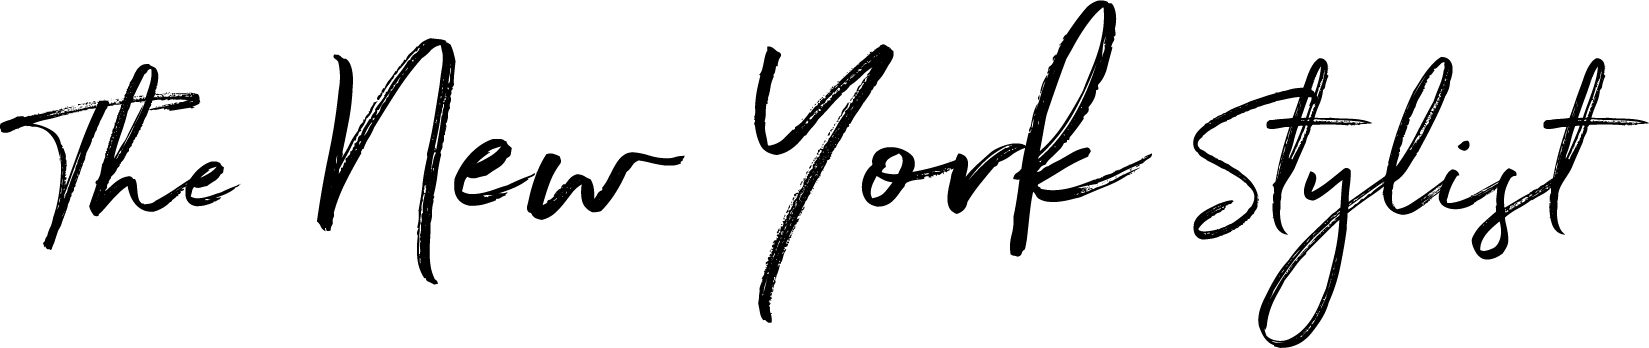 The New York Stylist logo